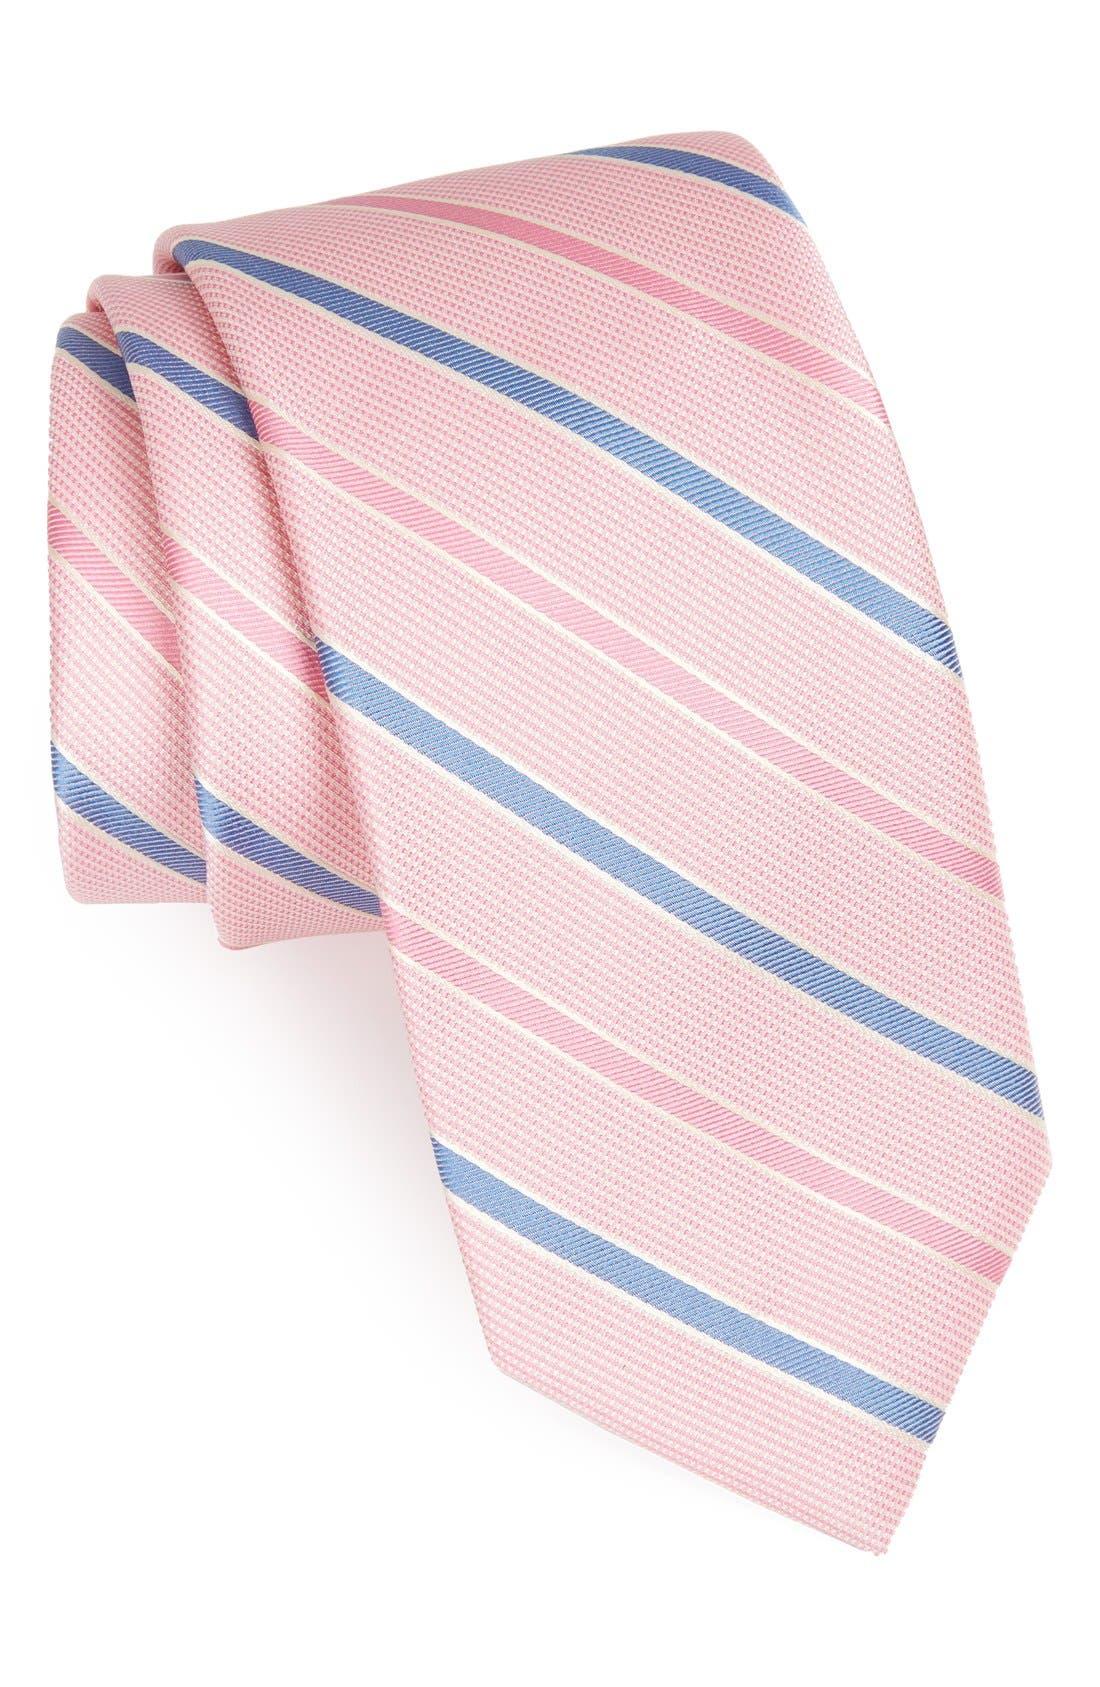 Alternate Image 1 Selected - Peter Millar Stripe Woven Silk Tie